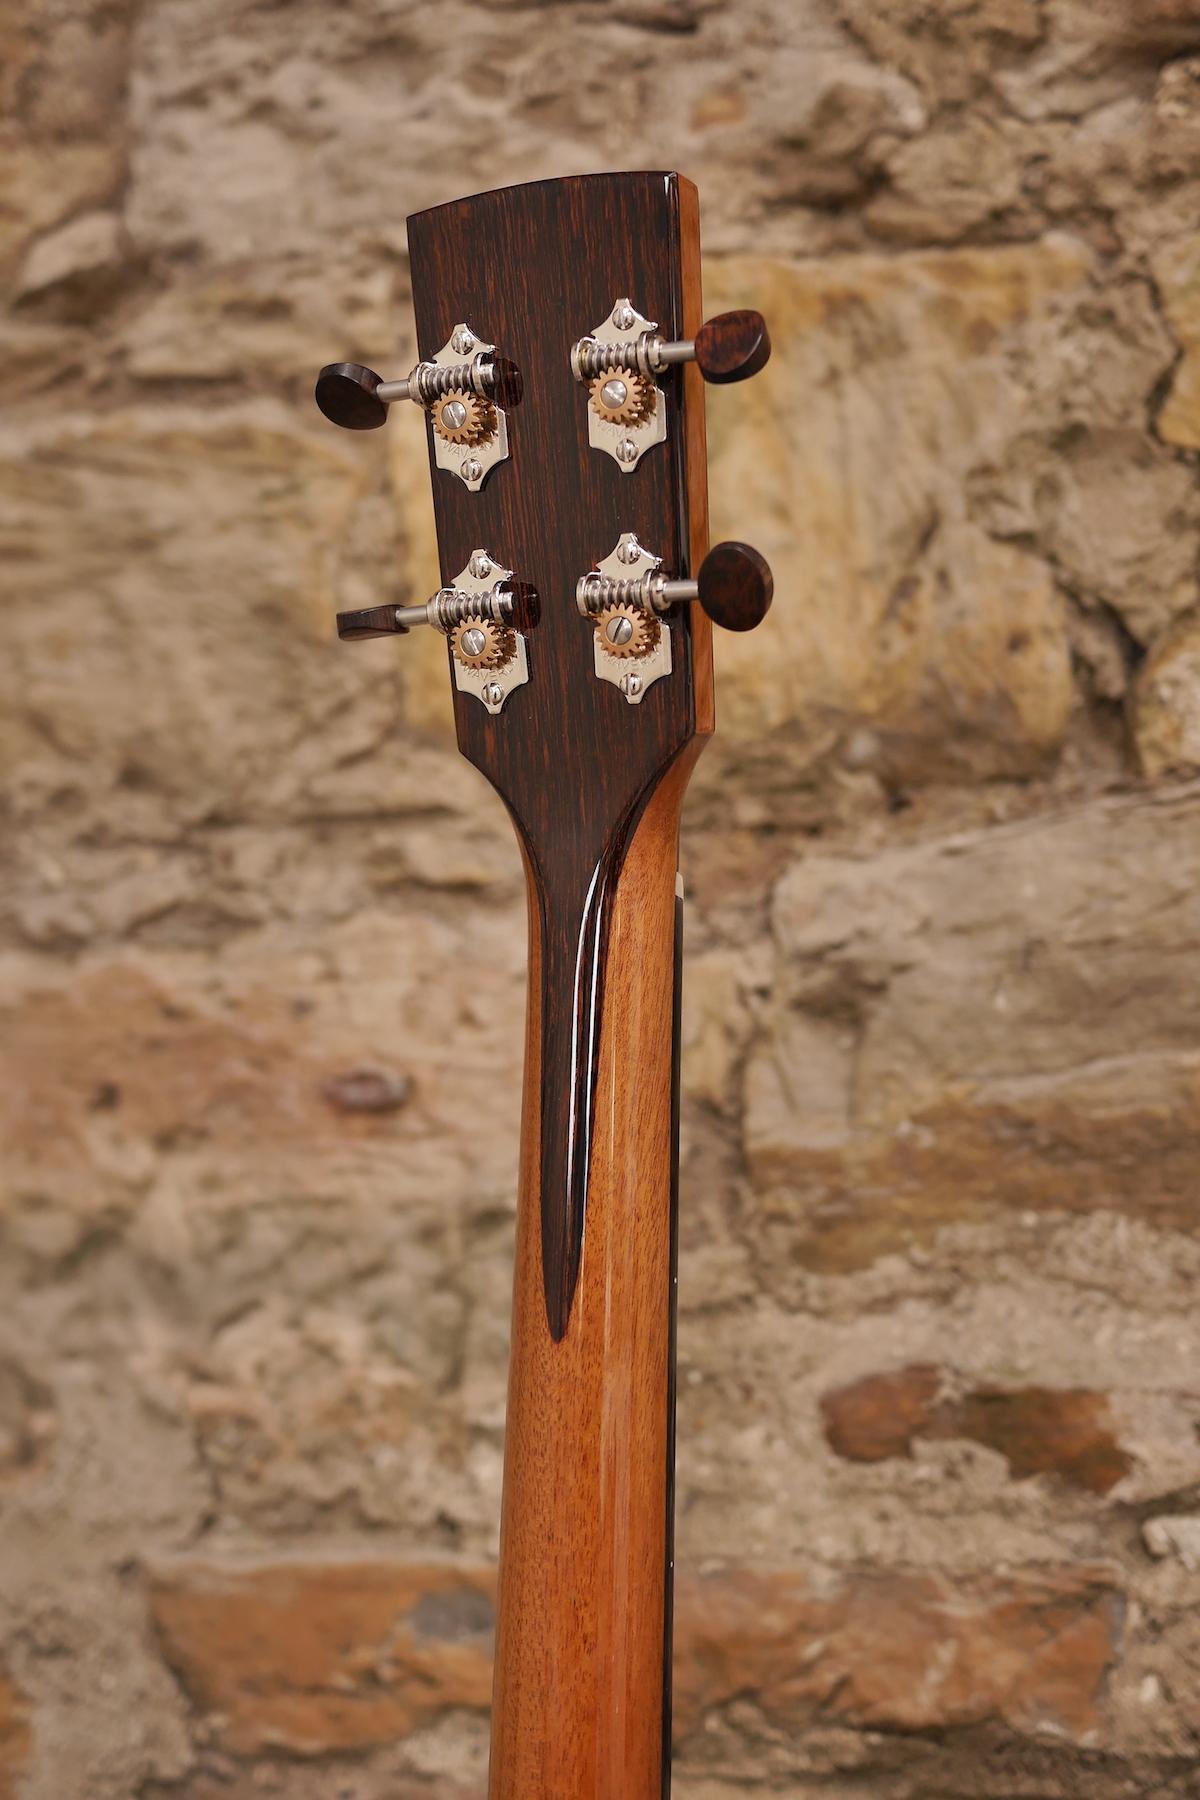 Dougie MacLean's Tenor with Spanish cedar neck